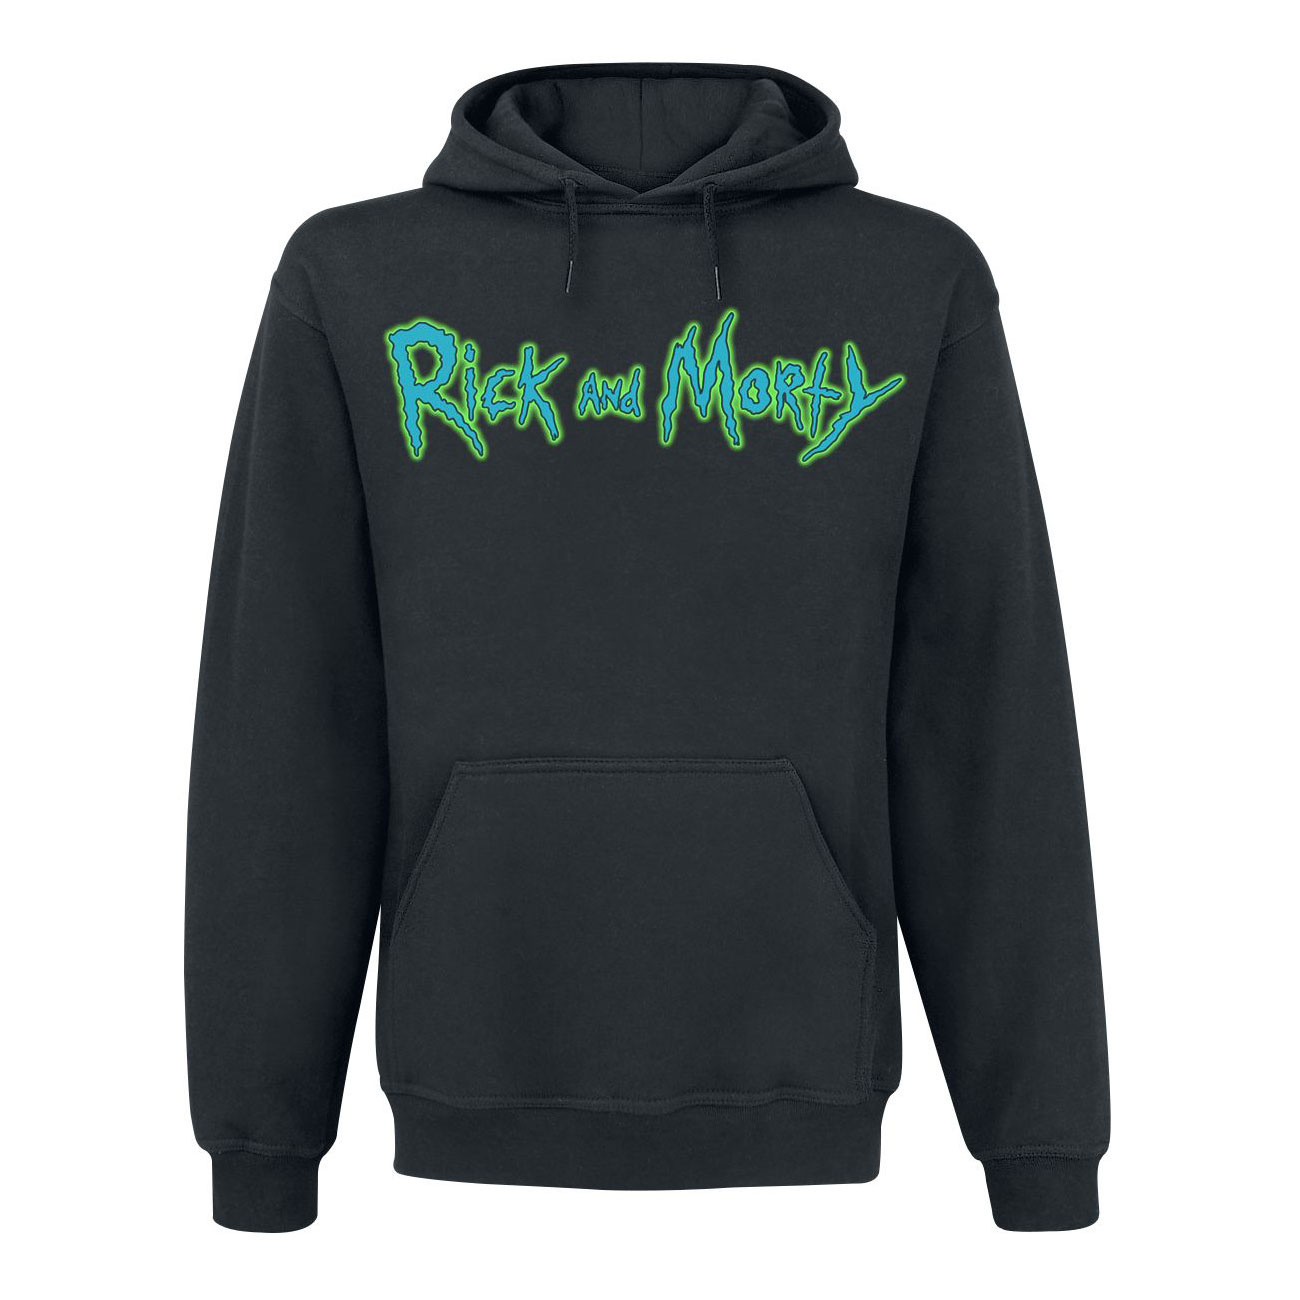 d74844946f9 Μπλούζα φούτερ με κουκούλα Rick and Morty-Riggity Riggity μαύρη size:L |  ToysForKids e-shop